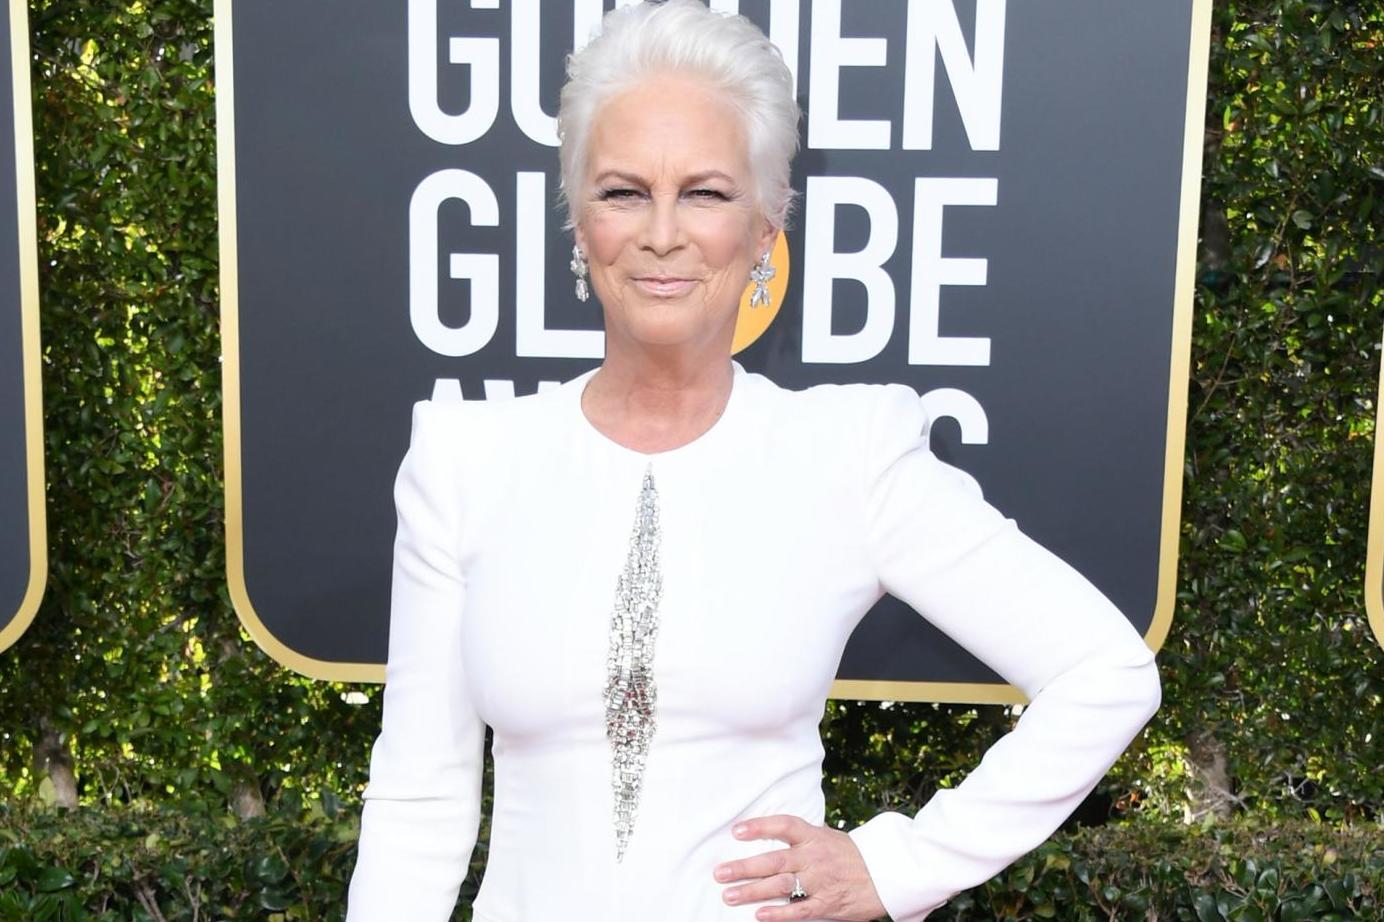 Golden Globes 2019: Jamie Lee Curtis slams viral 'Fiji water girl' for 'blatant promotion'